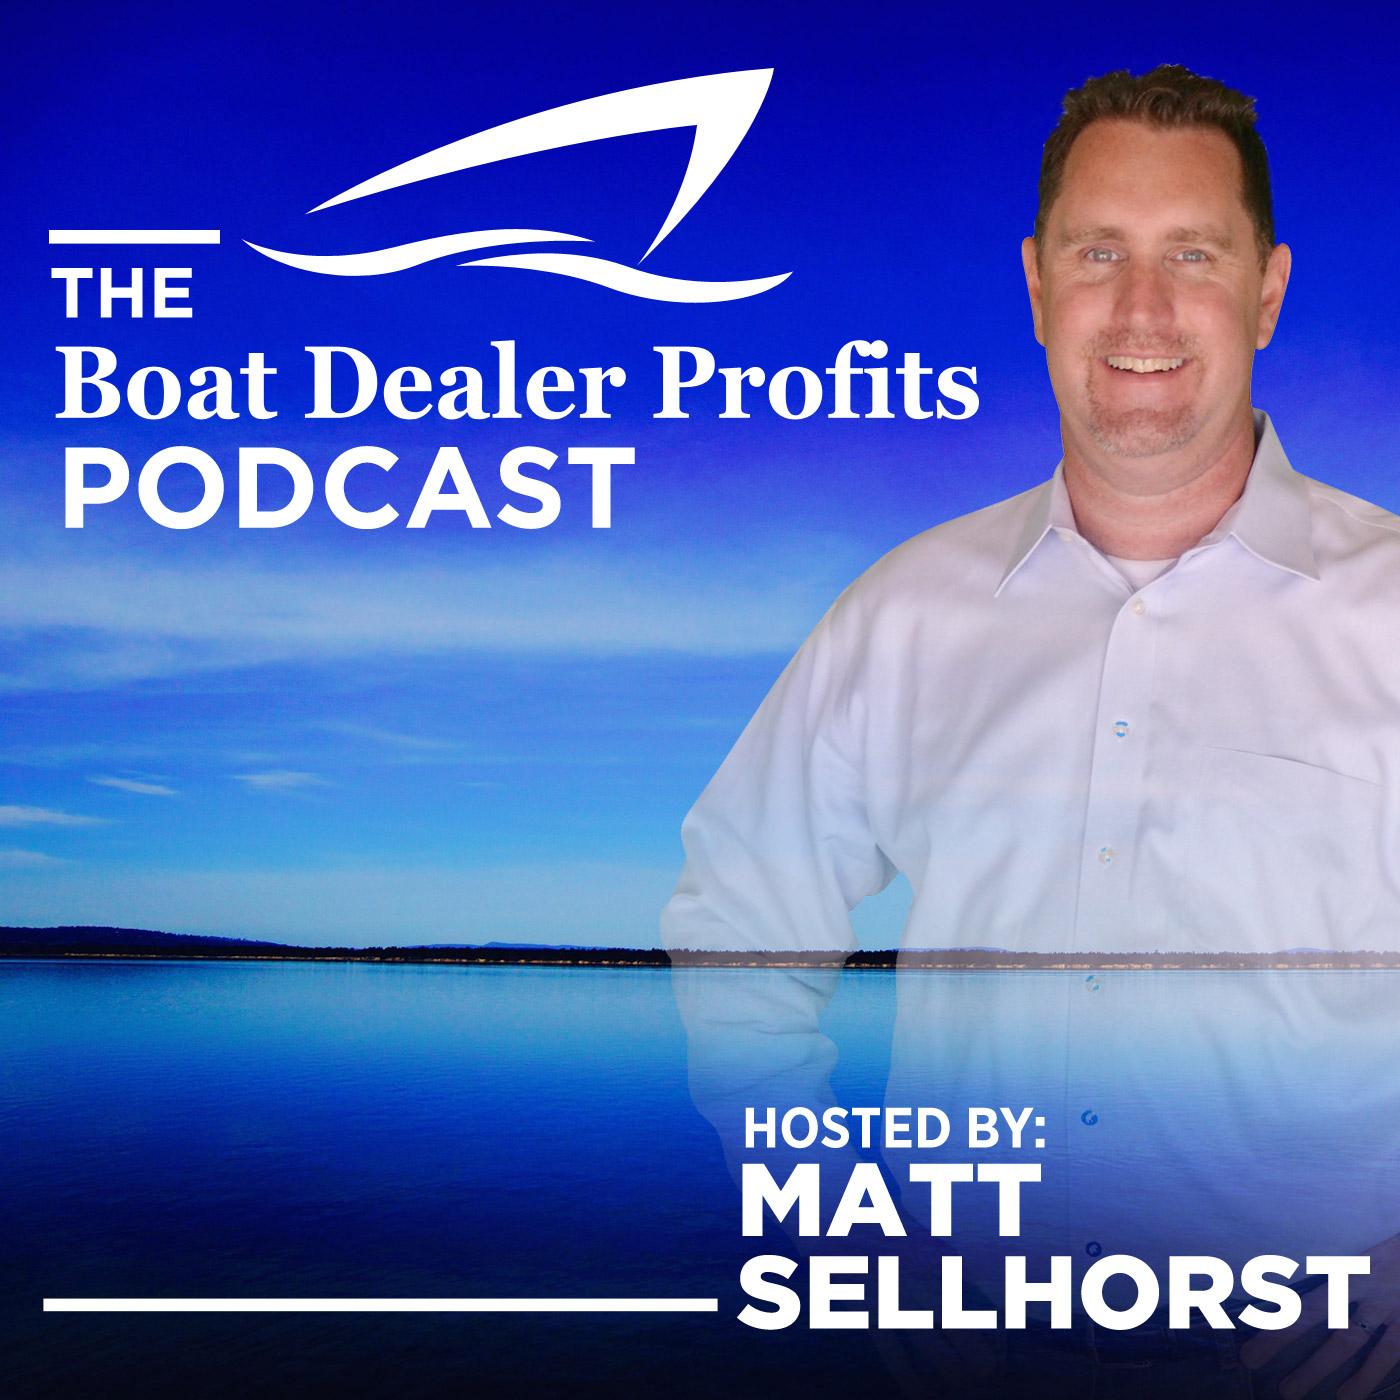 Boat Dealer Profits Podcast show art